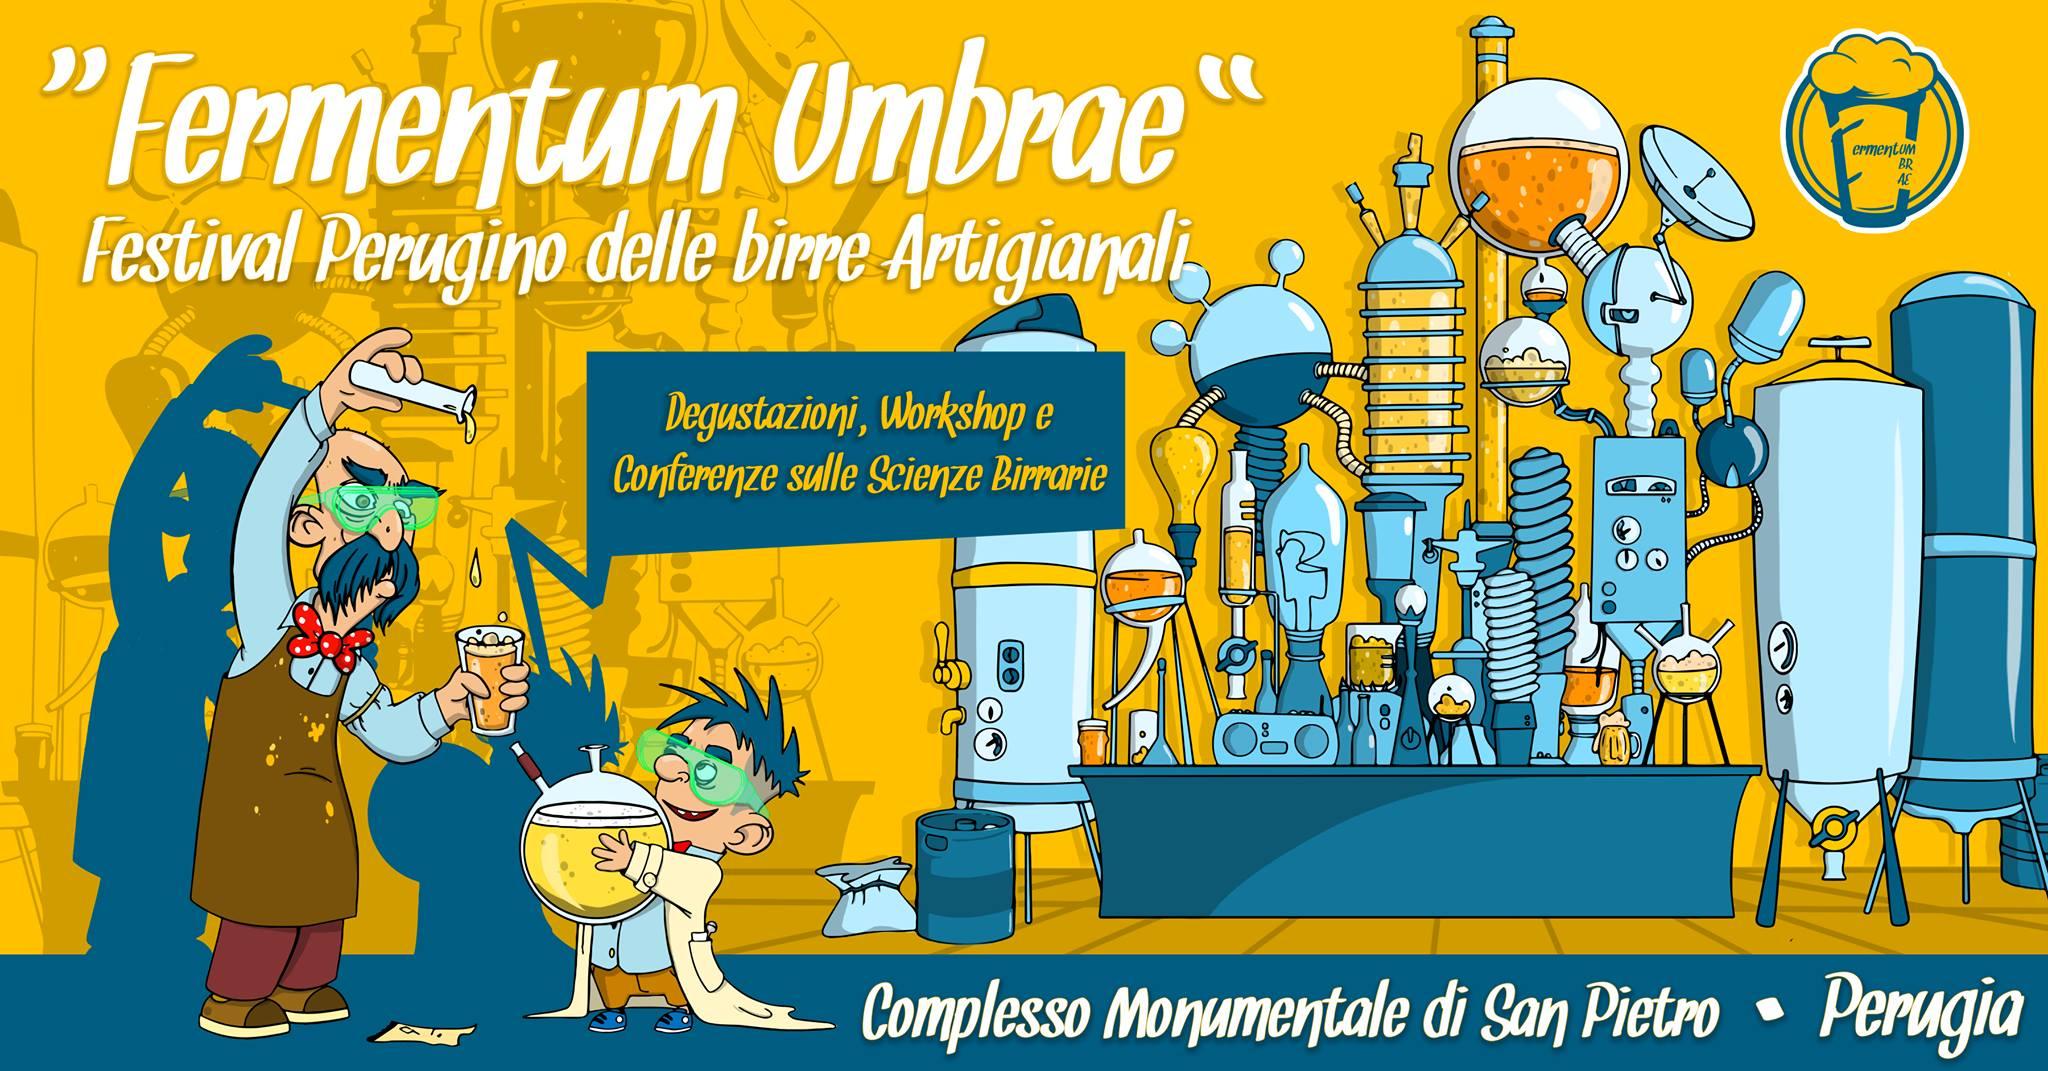 Dal 3 al 5 Maggio Fermentum Umbrae vi aspetta a Perugia!